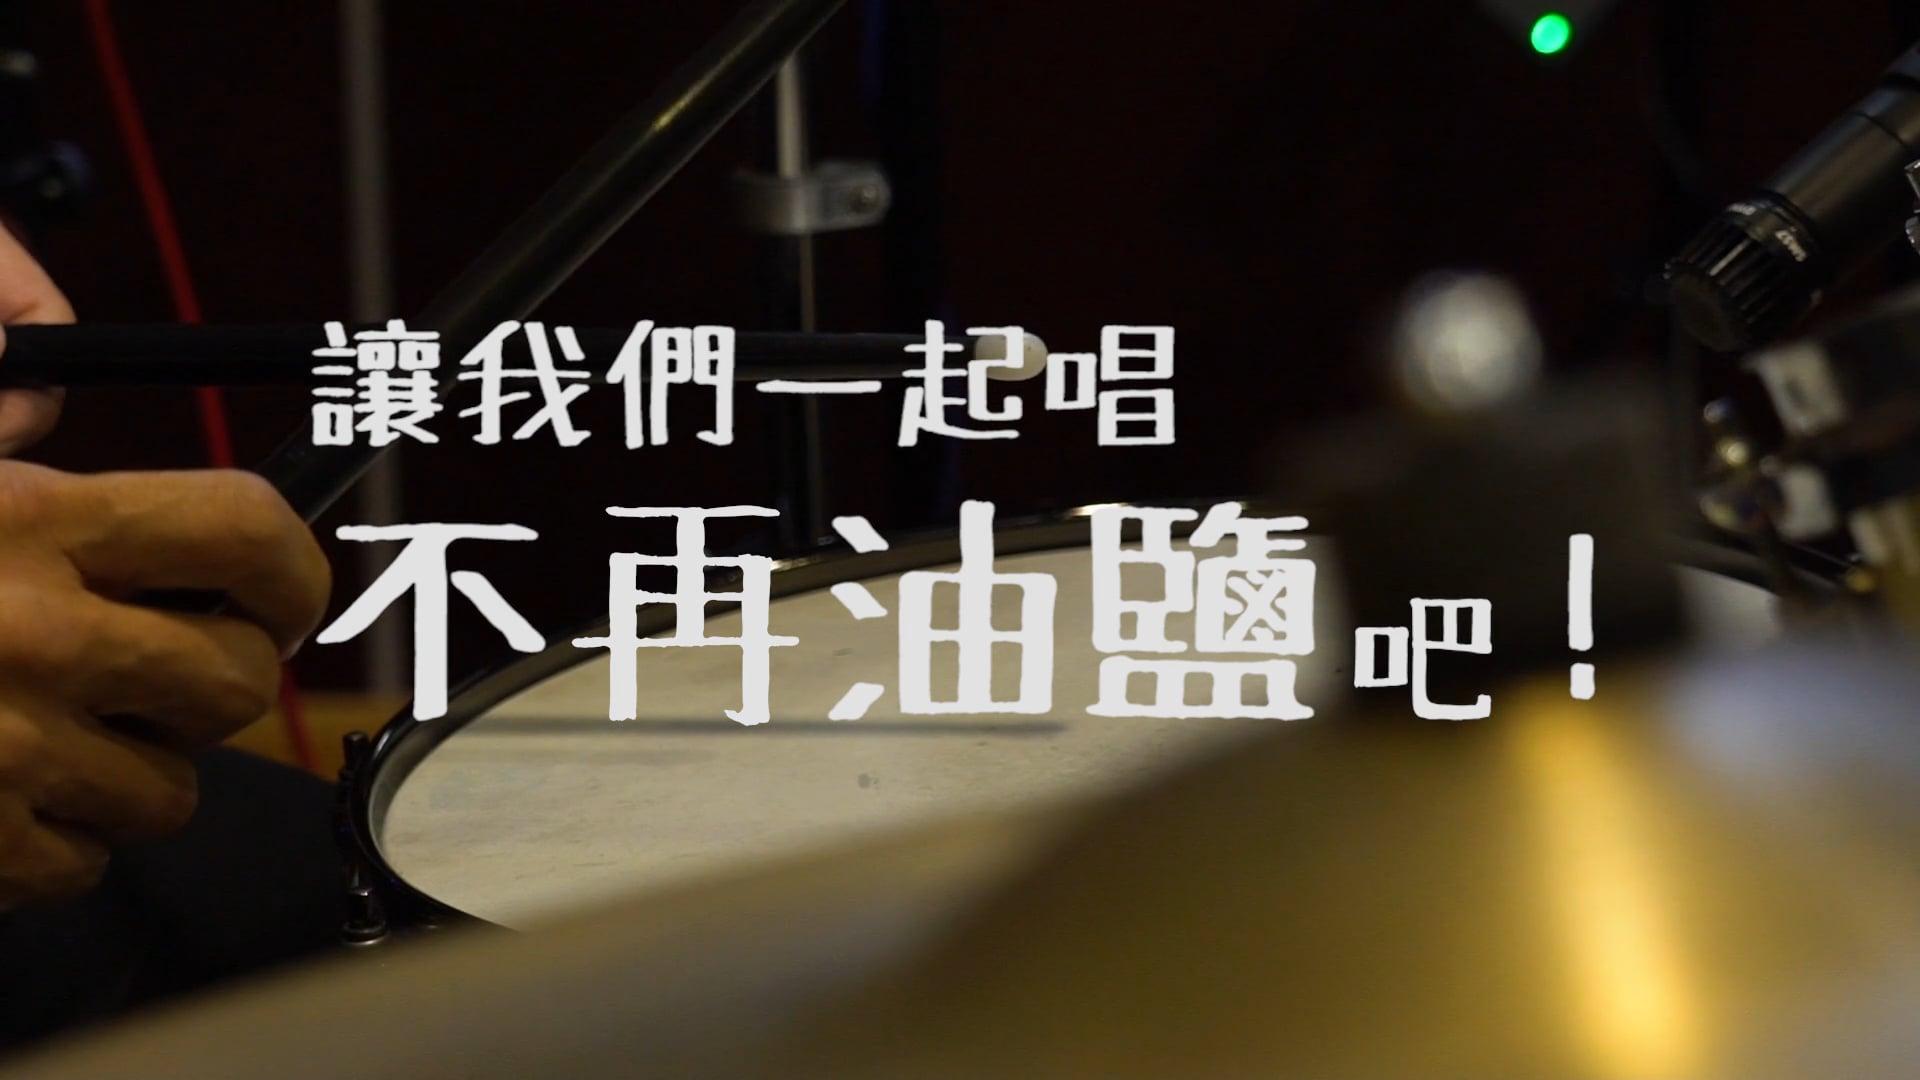 Food and Health Bureau (FHB) - 不再油鹽 Music Video